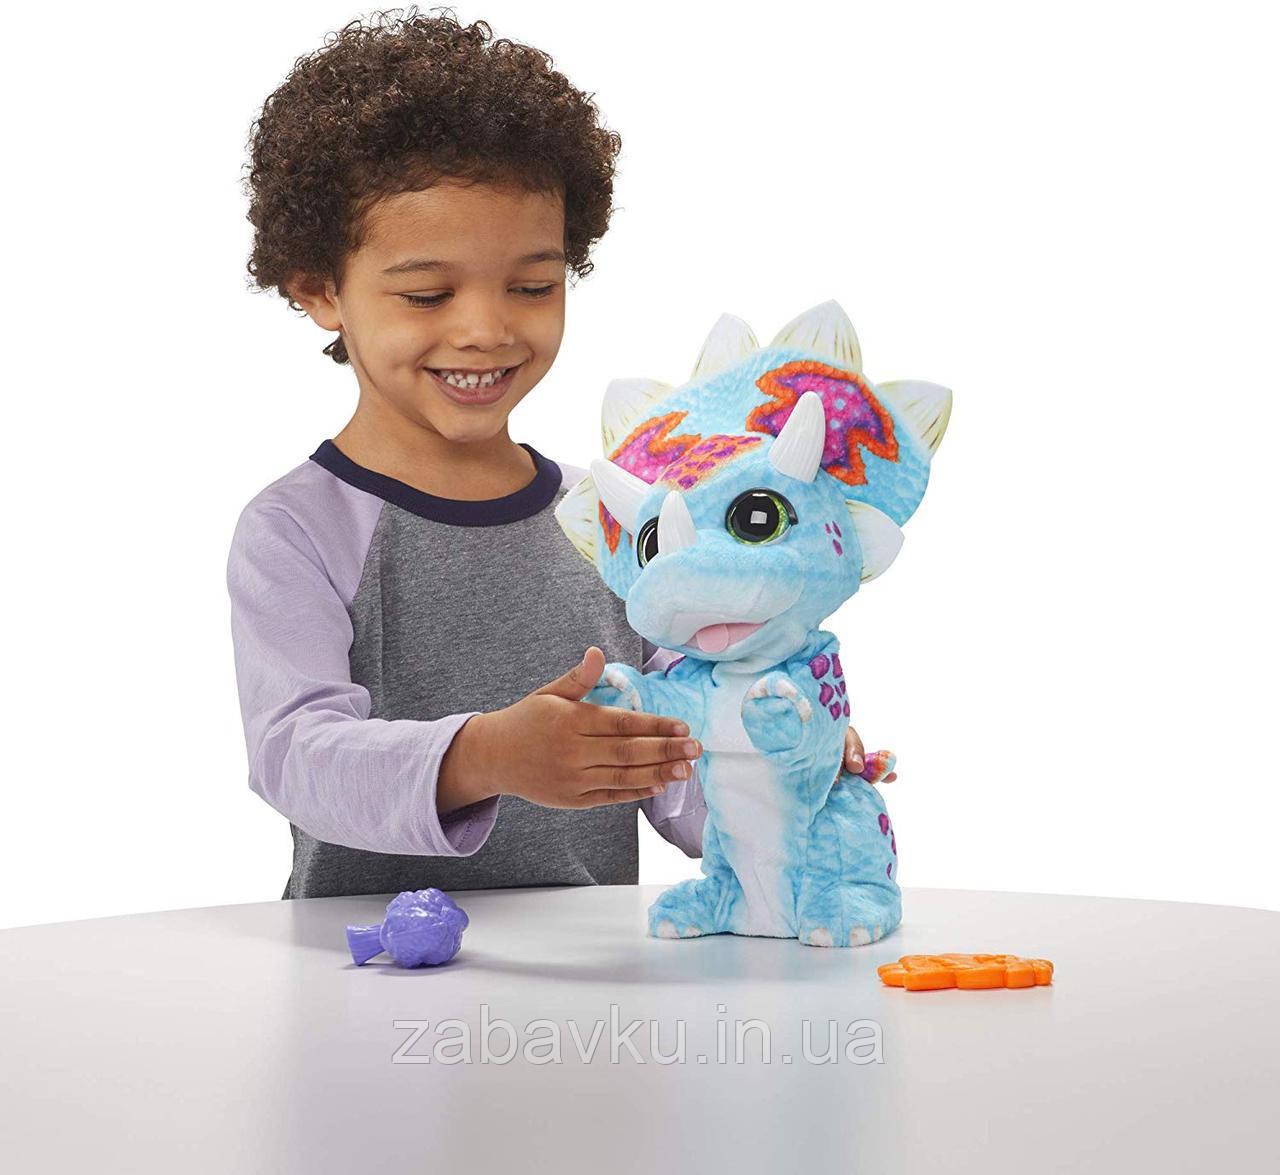 Фурріал інтерактивний Динозавр furReal Hoppin Topper Interactive Plush Pet Toy Hasbro